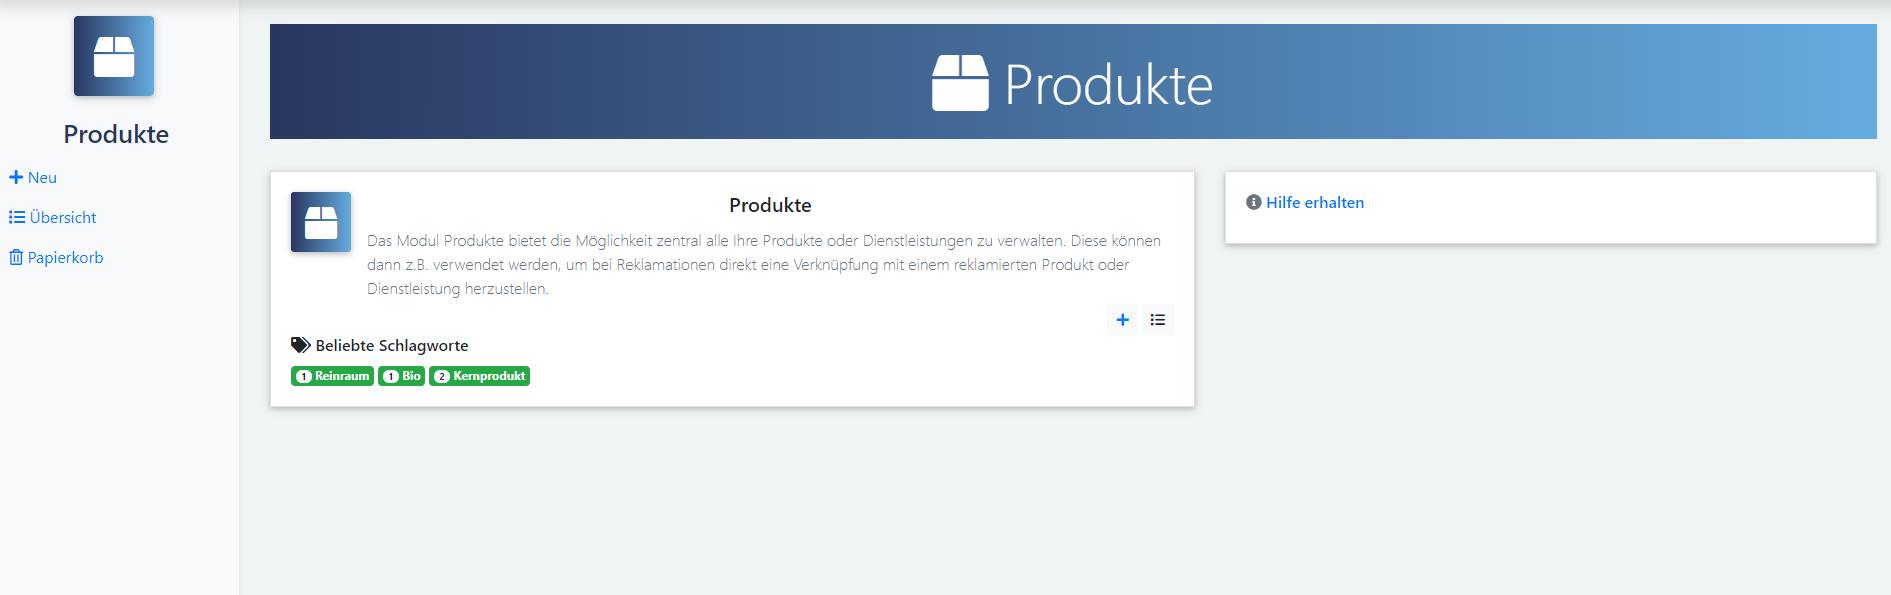 qmBase Software App Produkte Schlagwort Filter